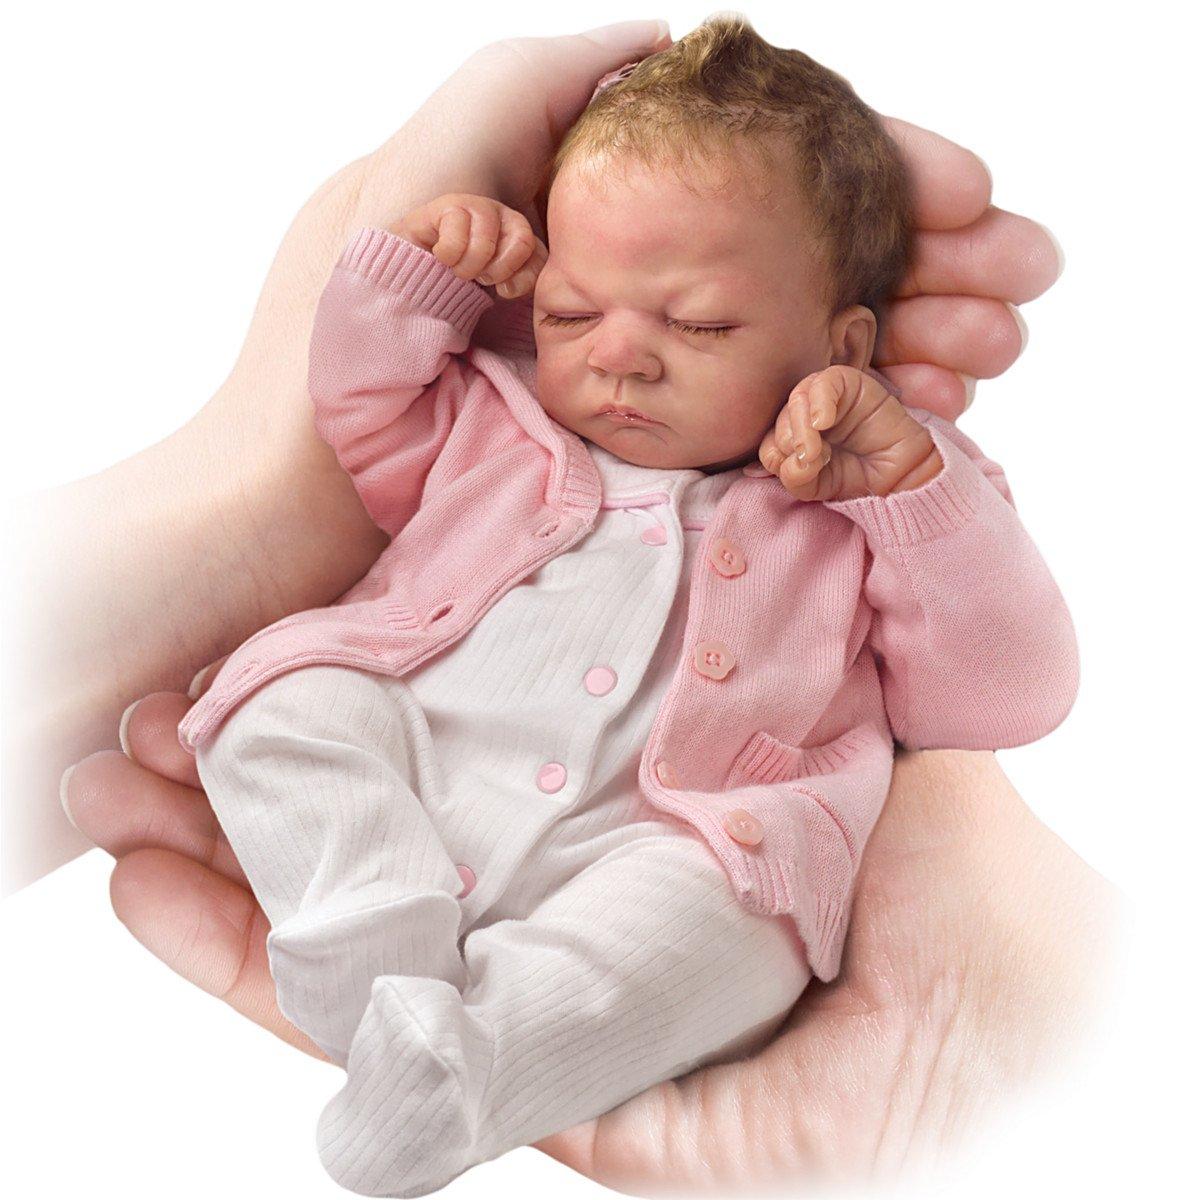 Tiny Miracles Linda Webb Emmy Lifelike Baby Doll So Truly Real 10